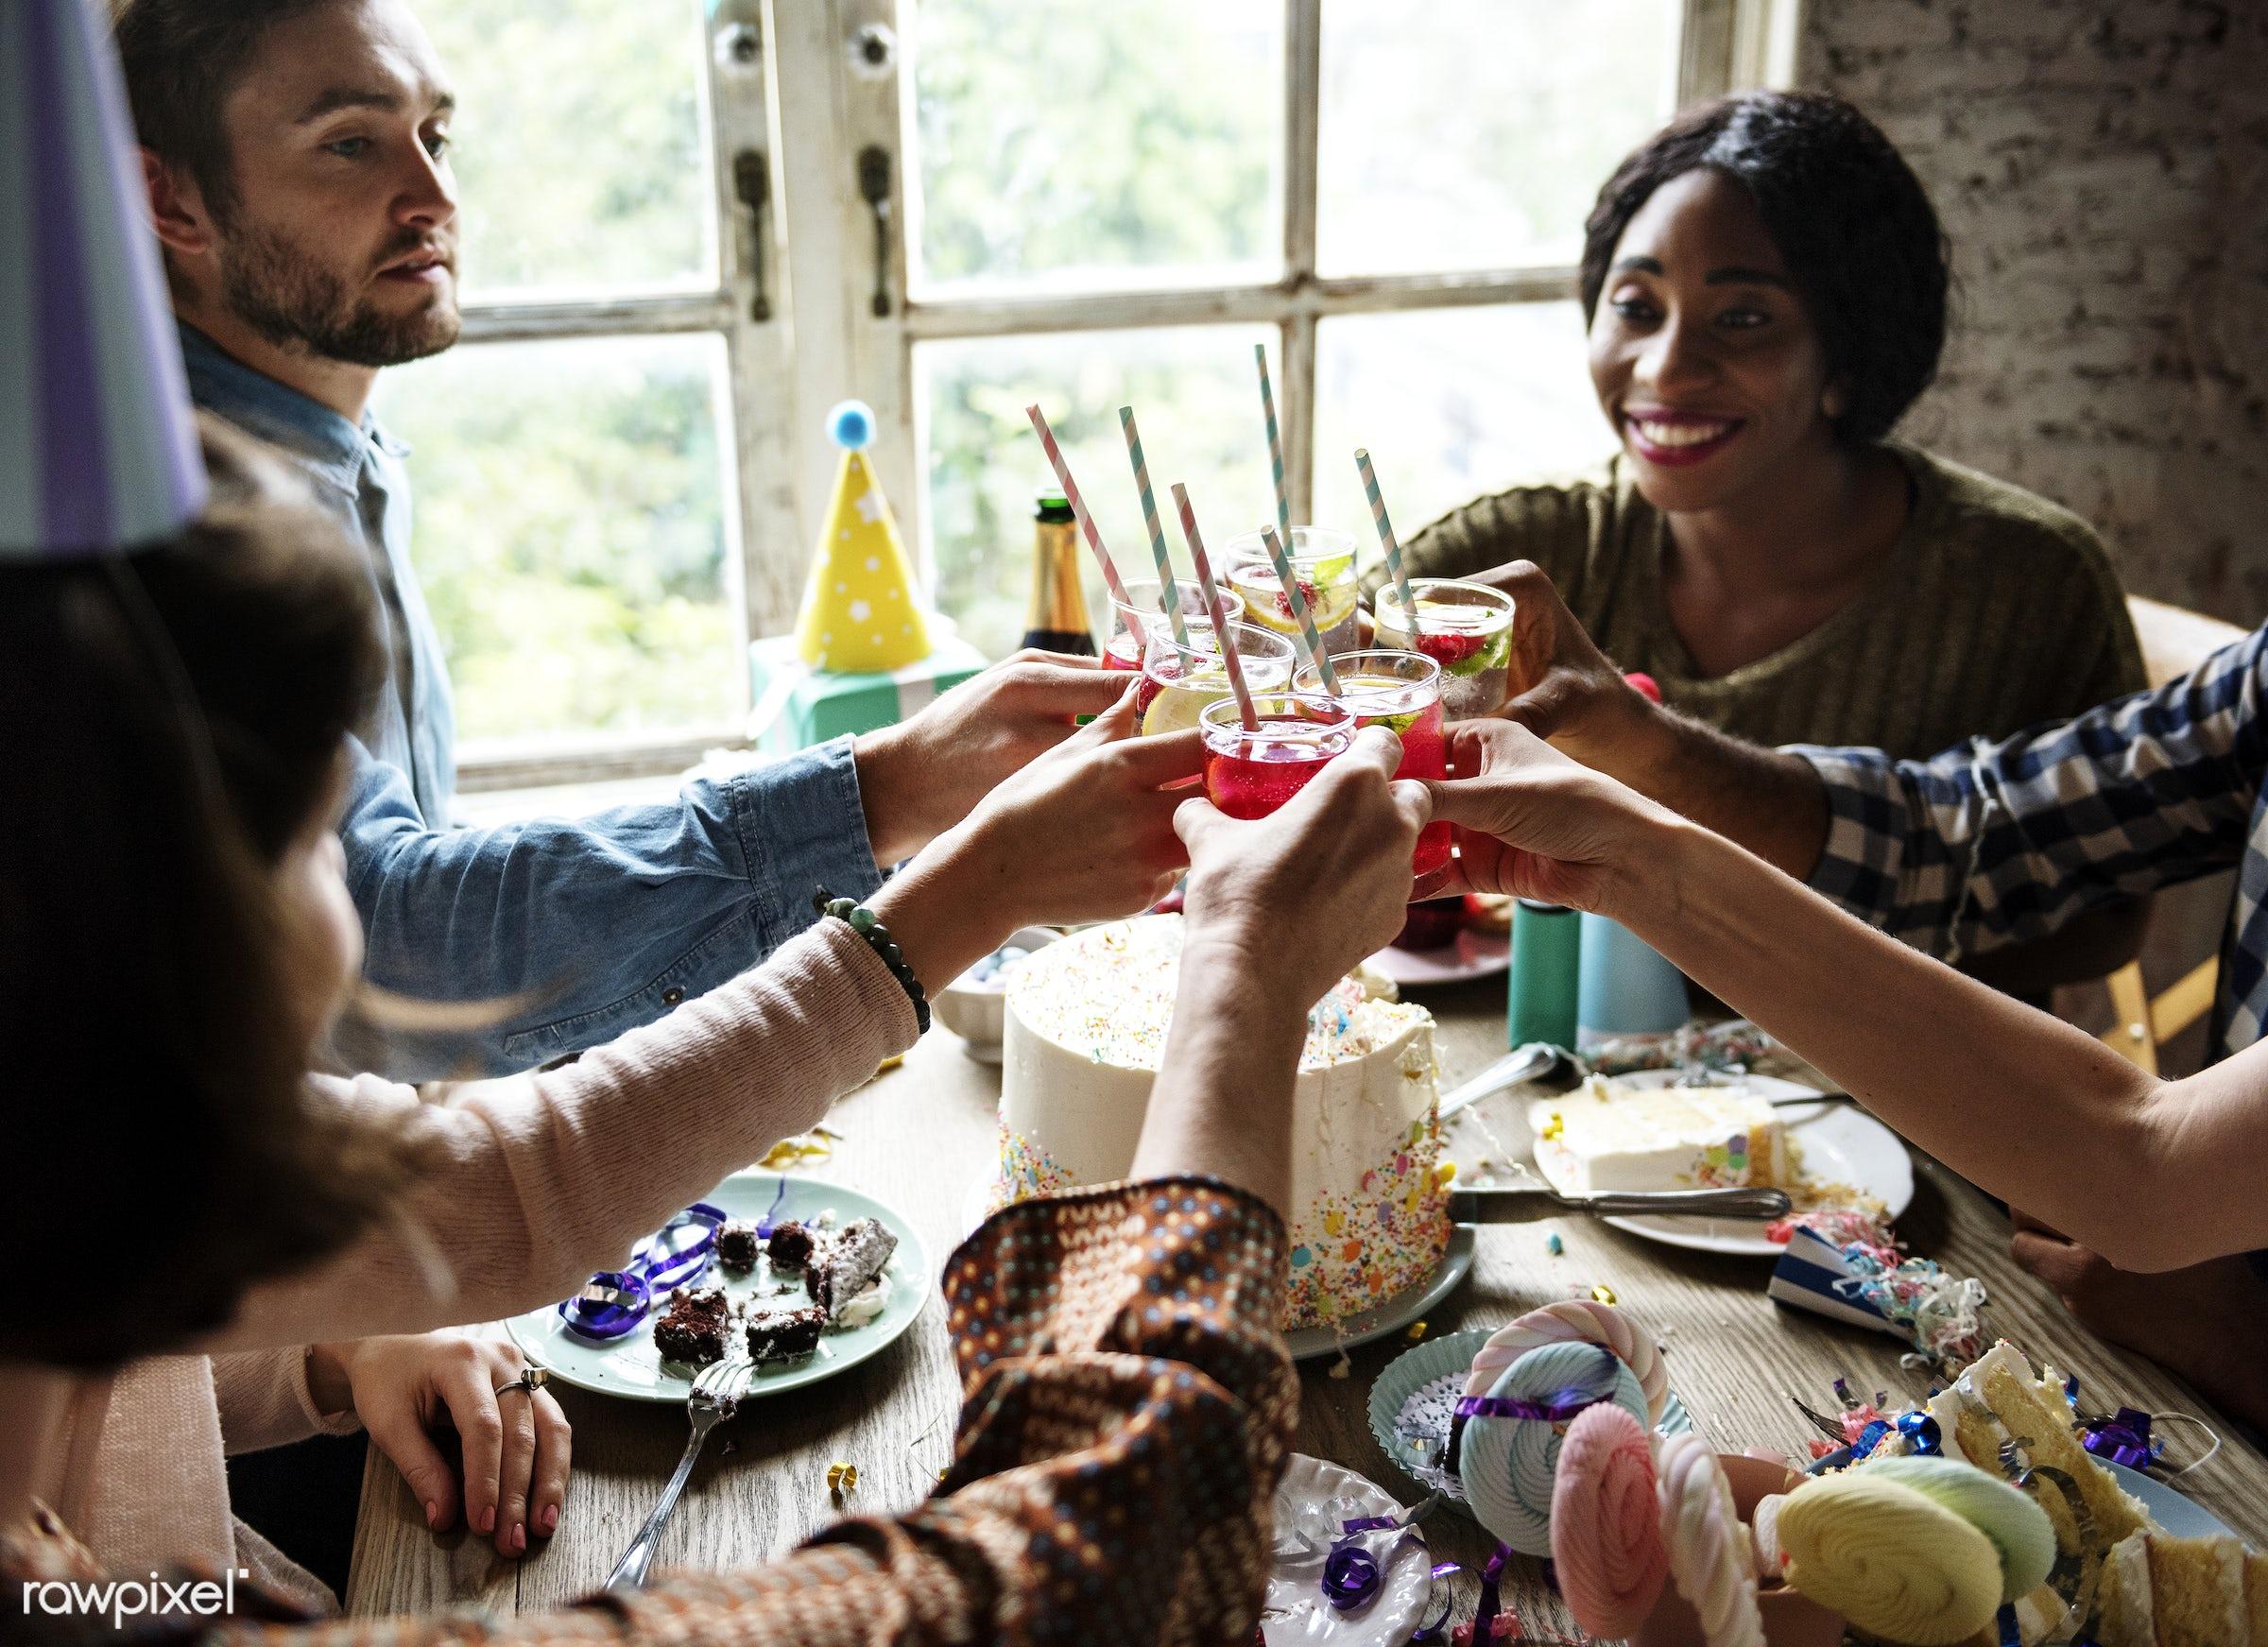 soda, bakery, birthday, cakes, celebrate, celebration, cheerful, cheers, delicious, dessert, diverse, diversity, drink,...